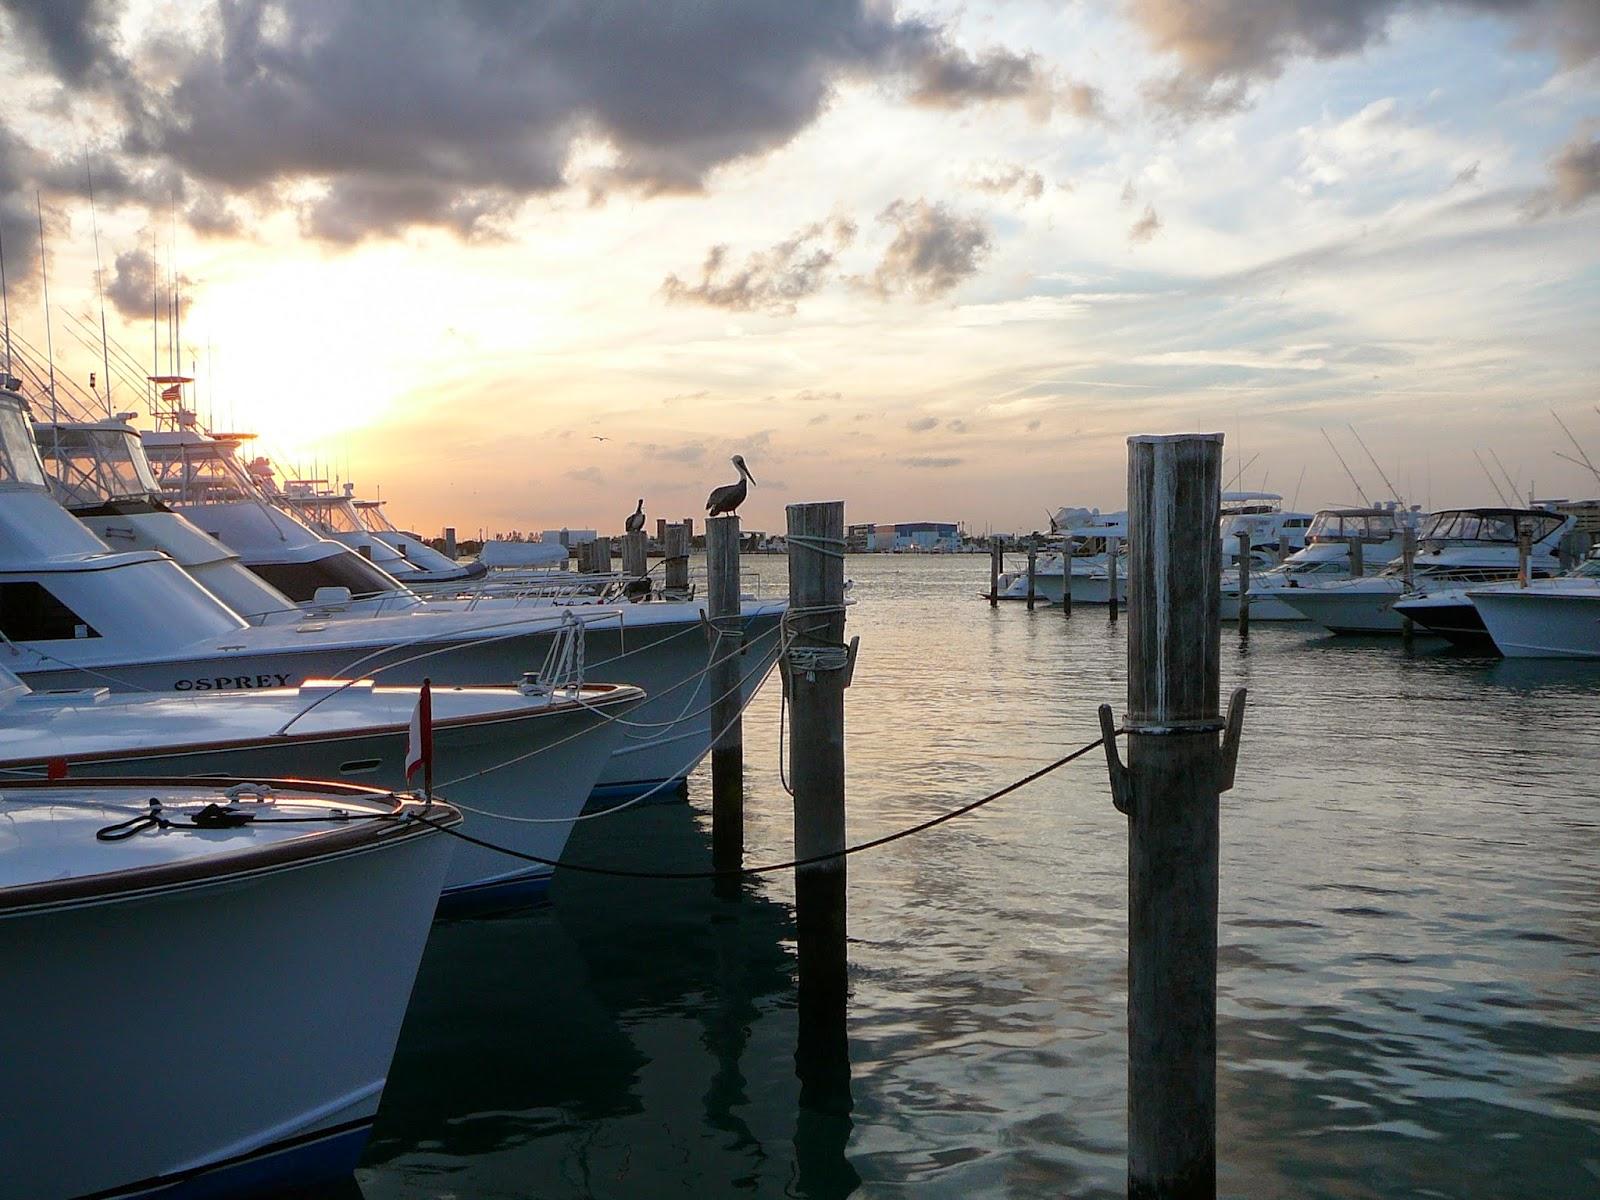 Third age traveler june 2014 for Sailfish marina